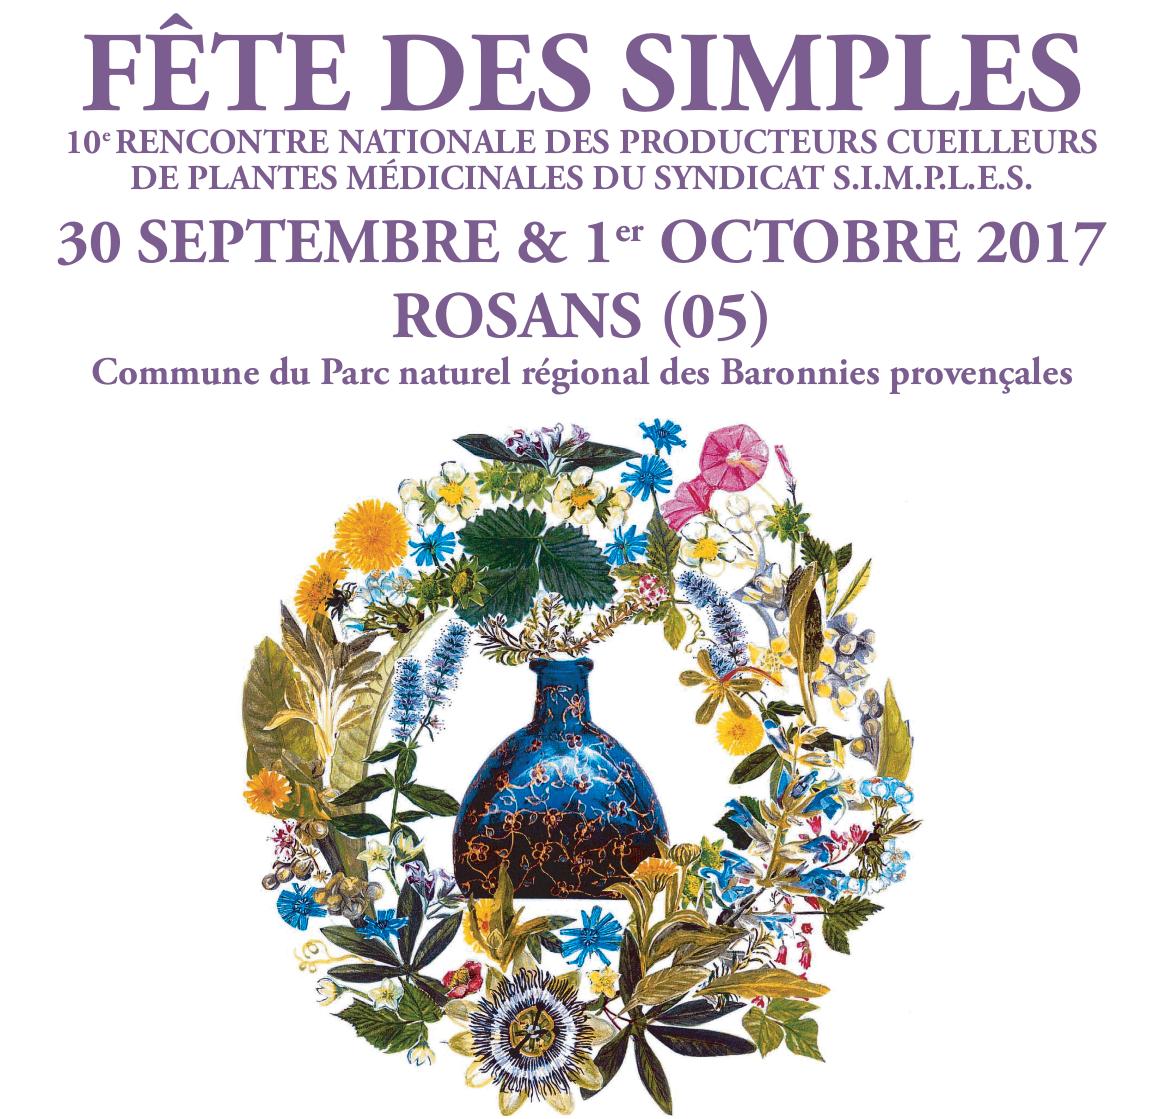 30 SEPTEMBRE -1er OCTOBRE 2017